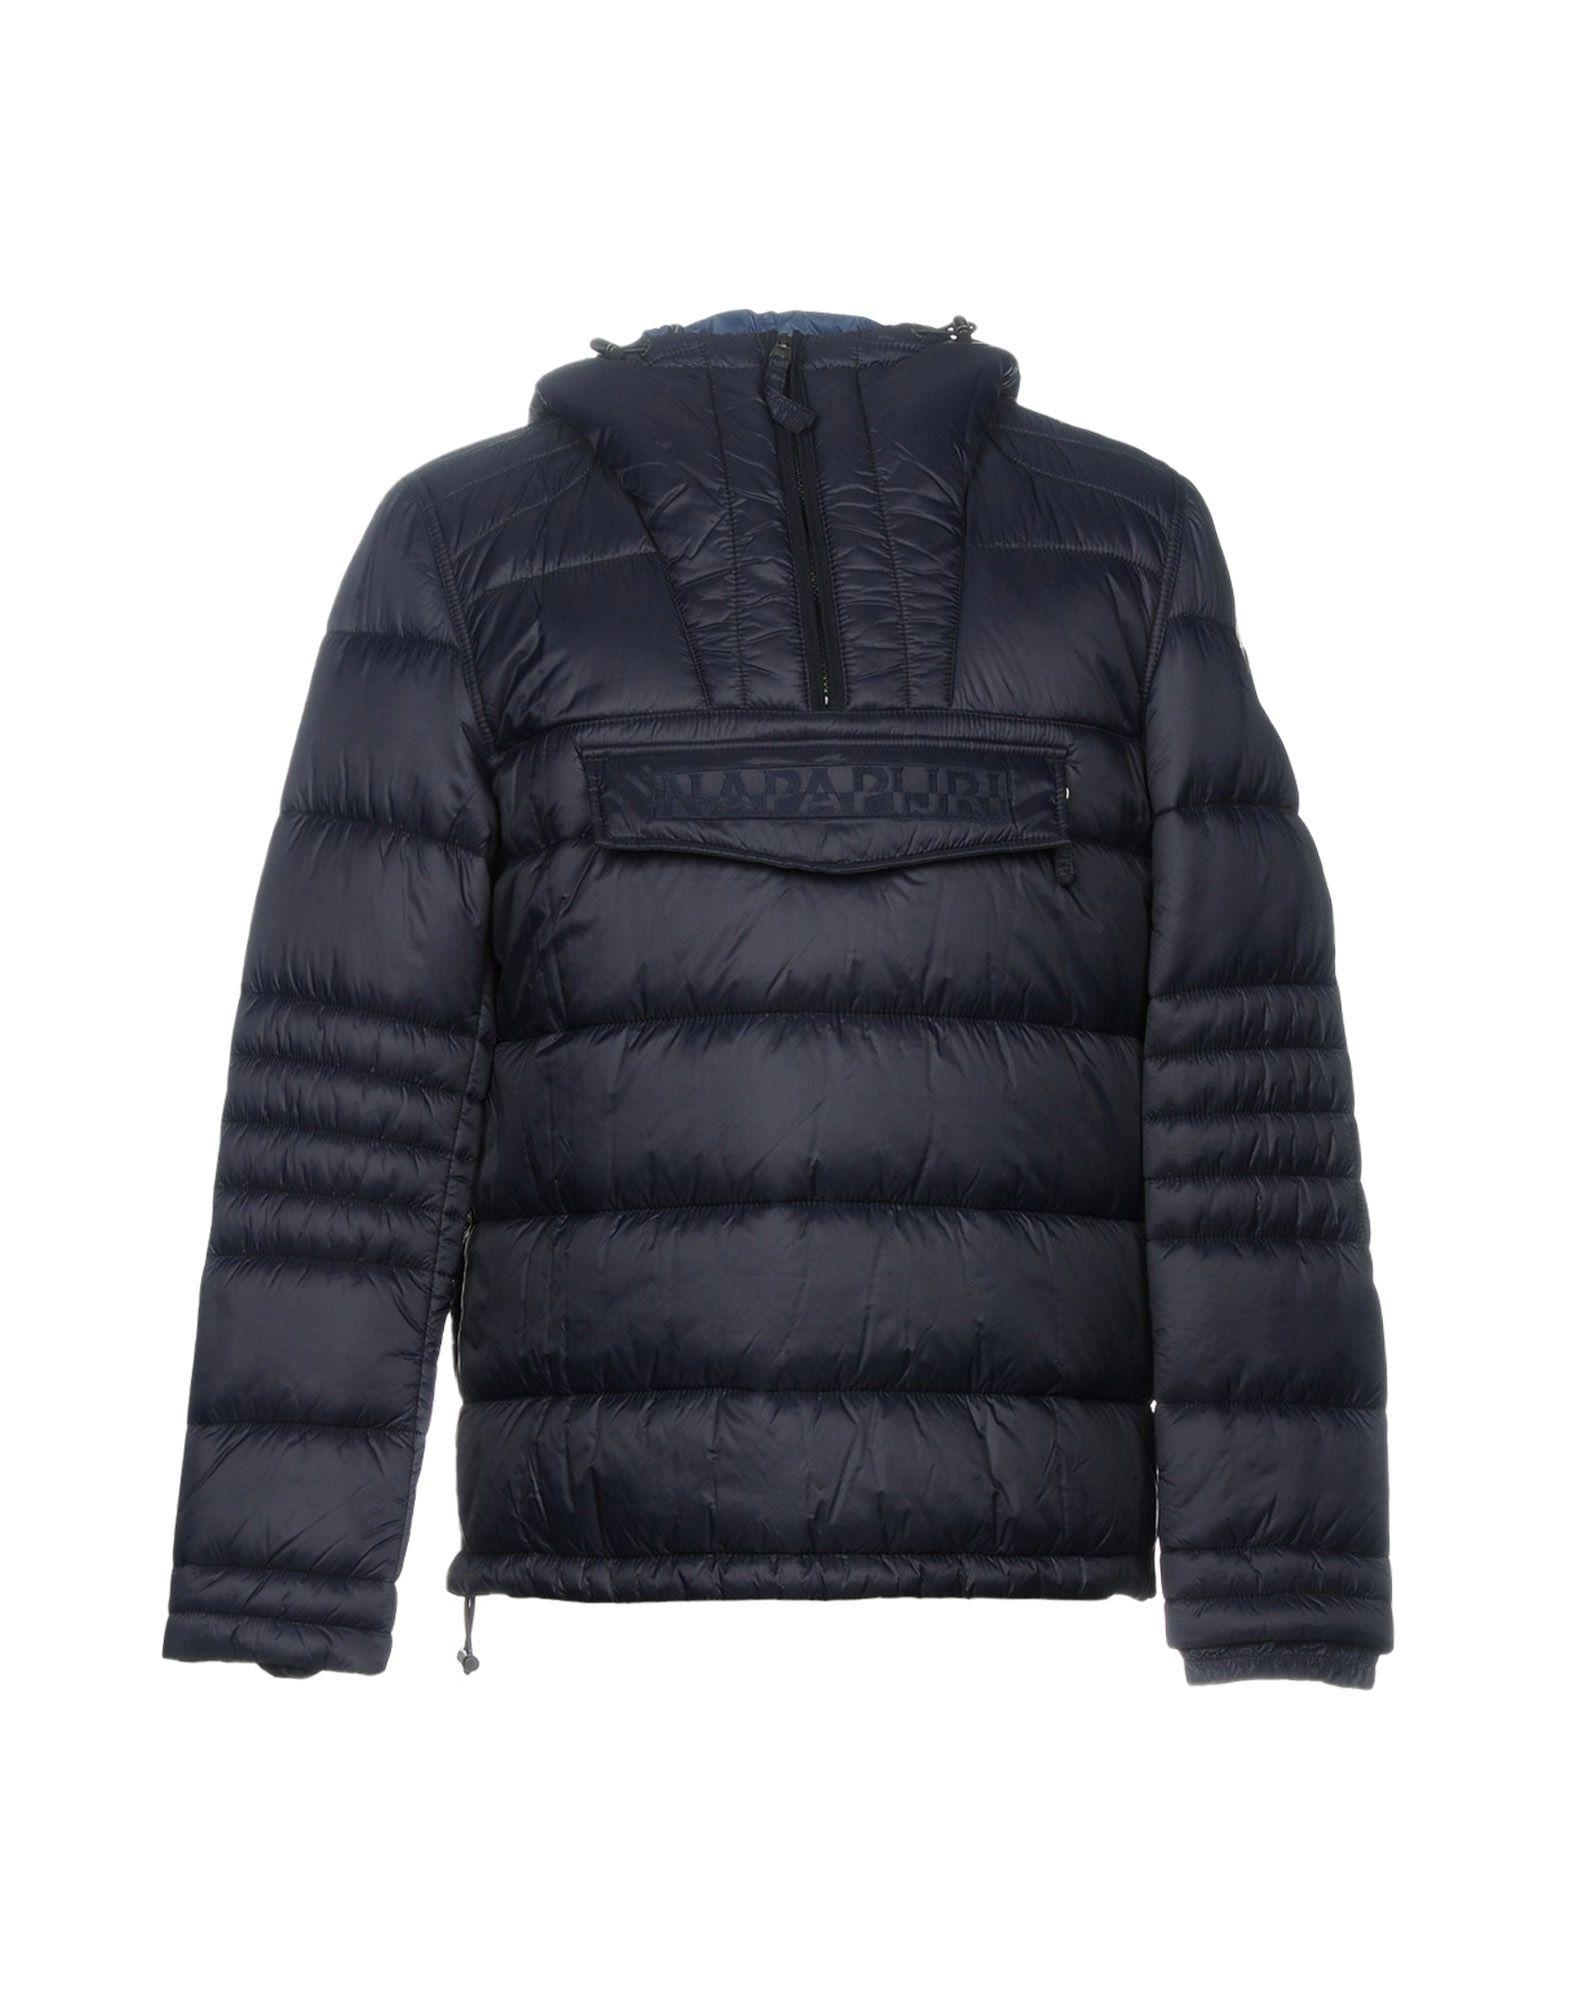 Napapijri Synthetic Down Jacket In Blue